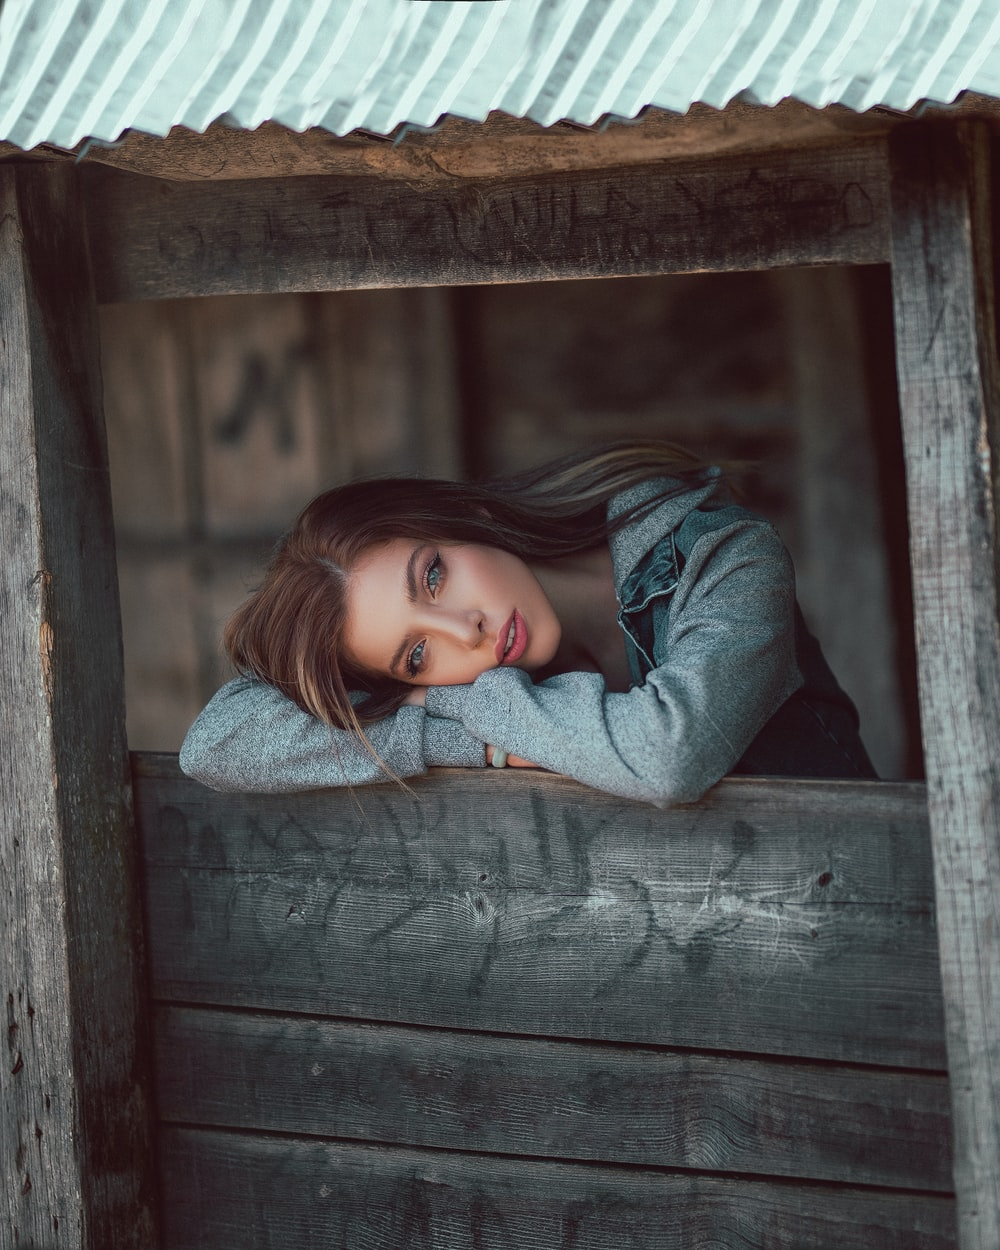 woman leaning forward on wooden window sill